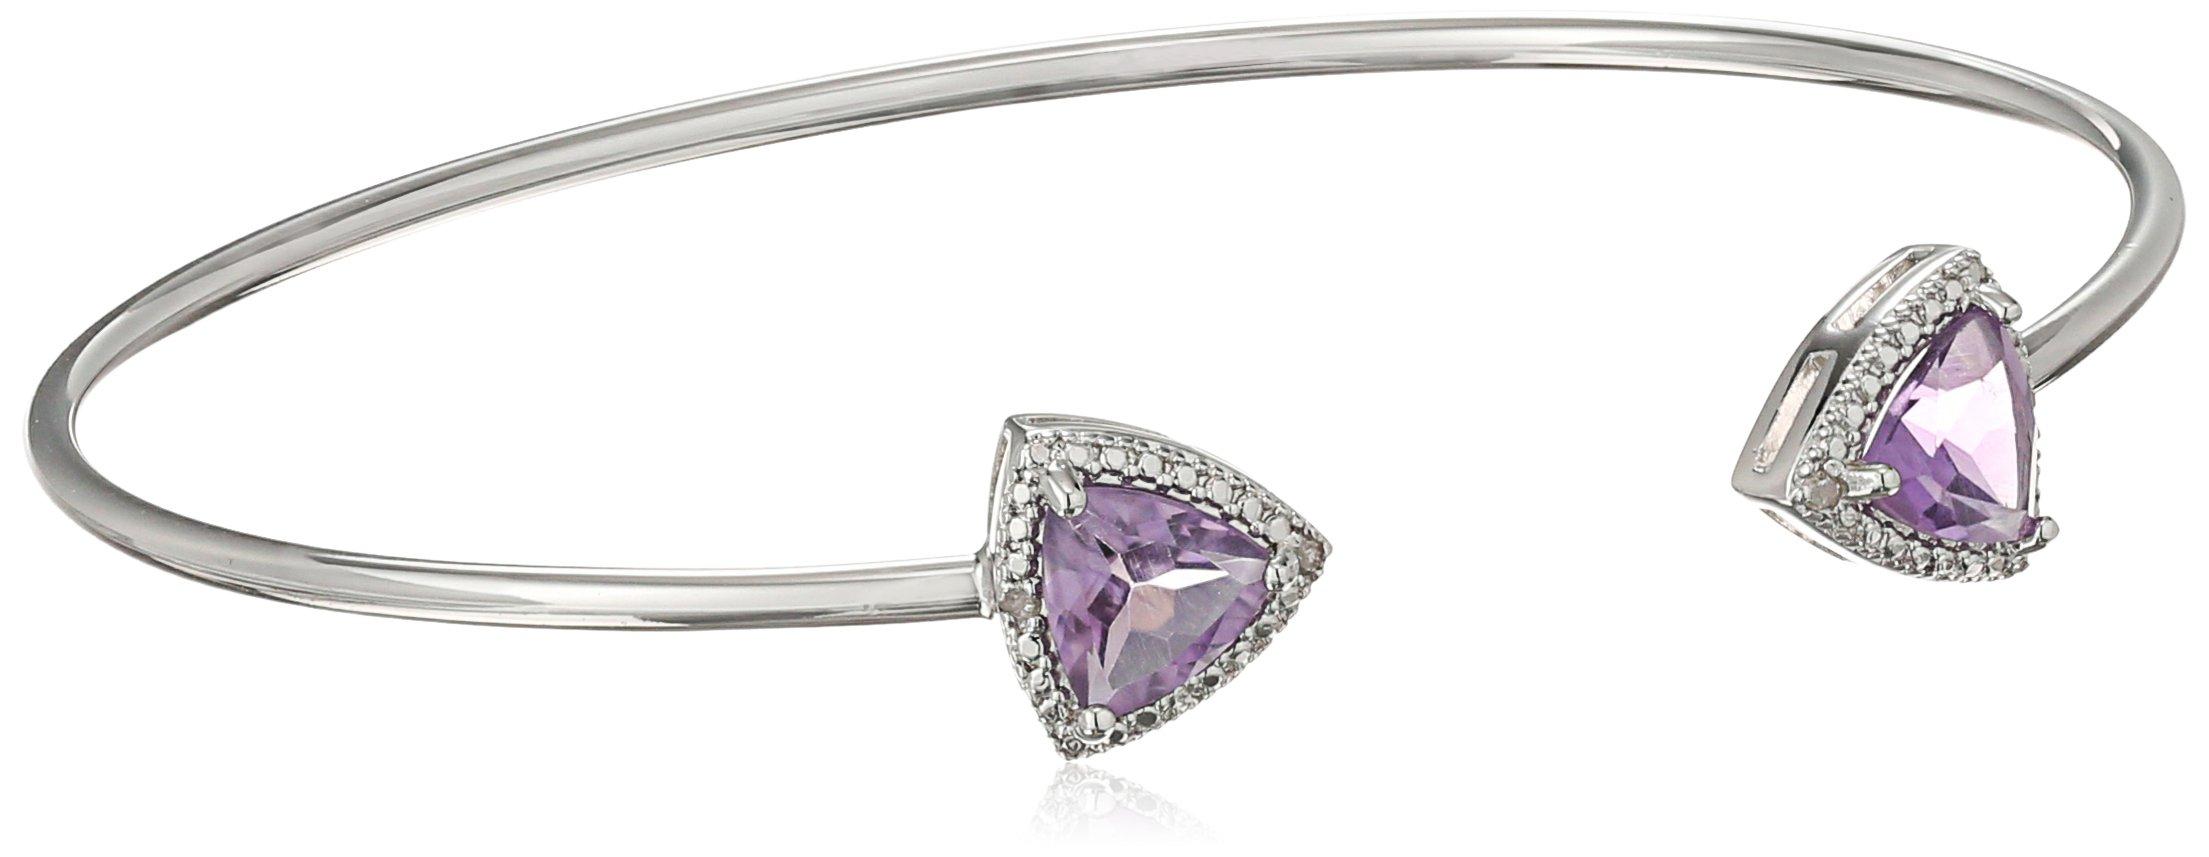 Amethyst and Diamond with Rhodium Plating Bangle Bracelet